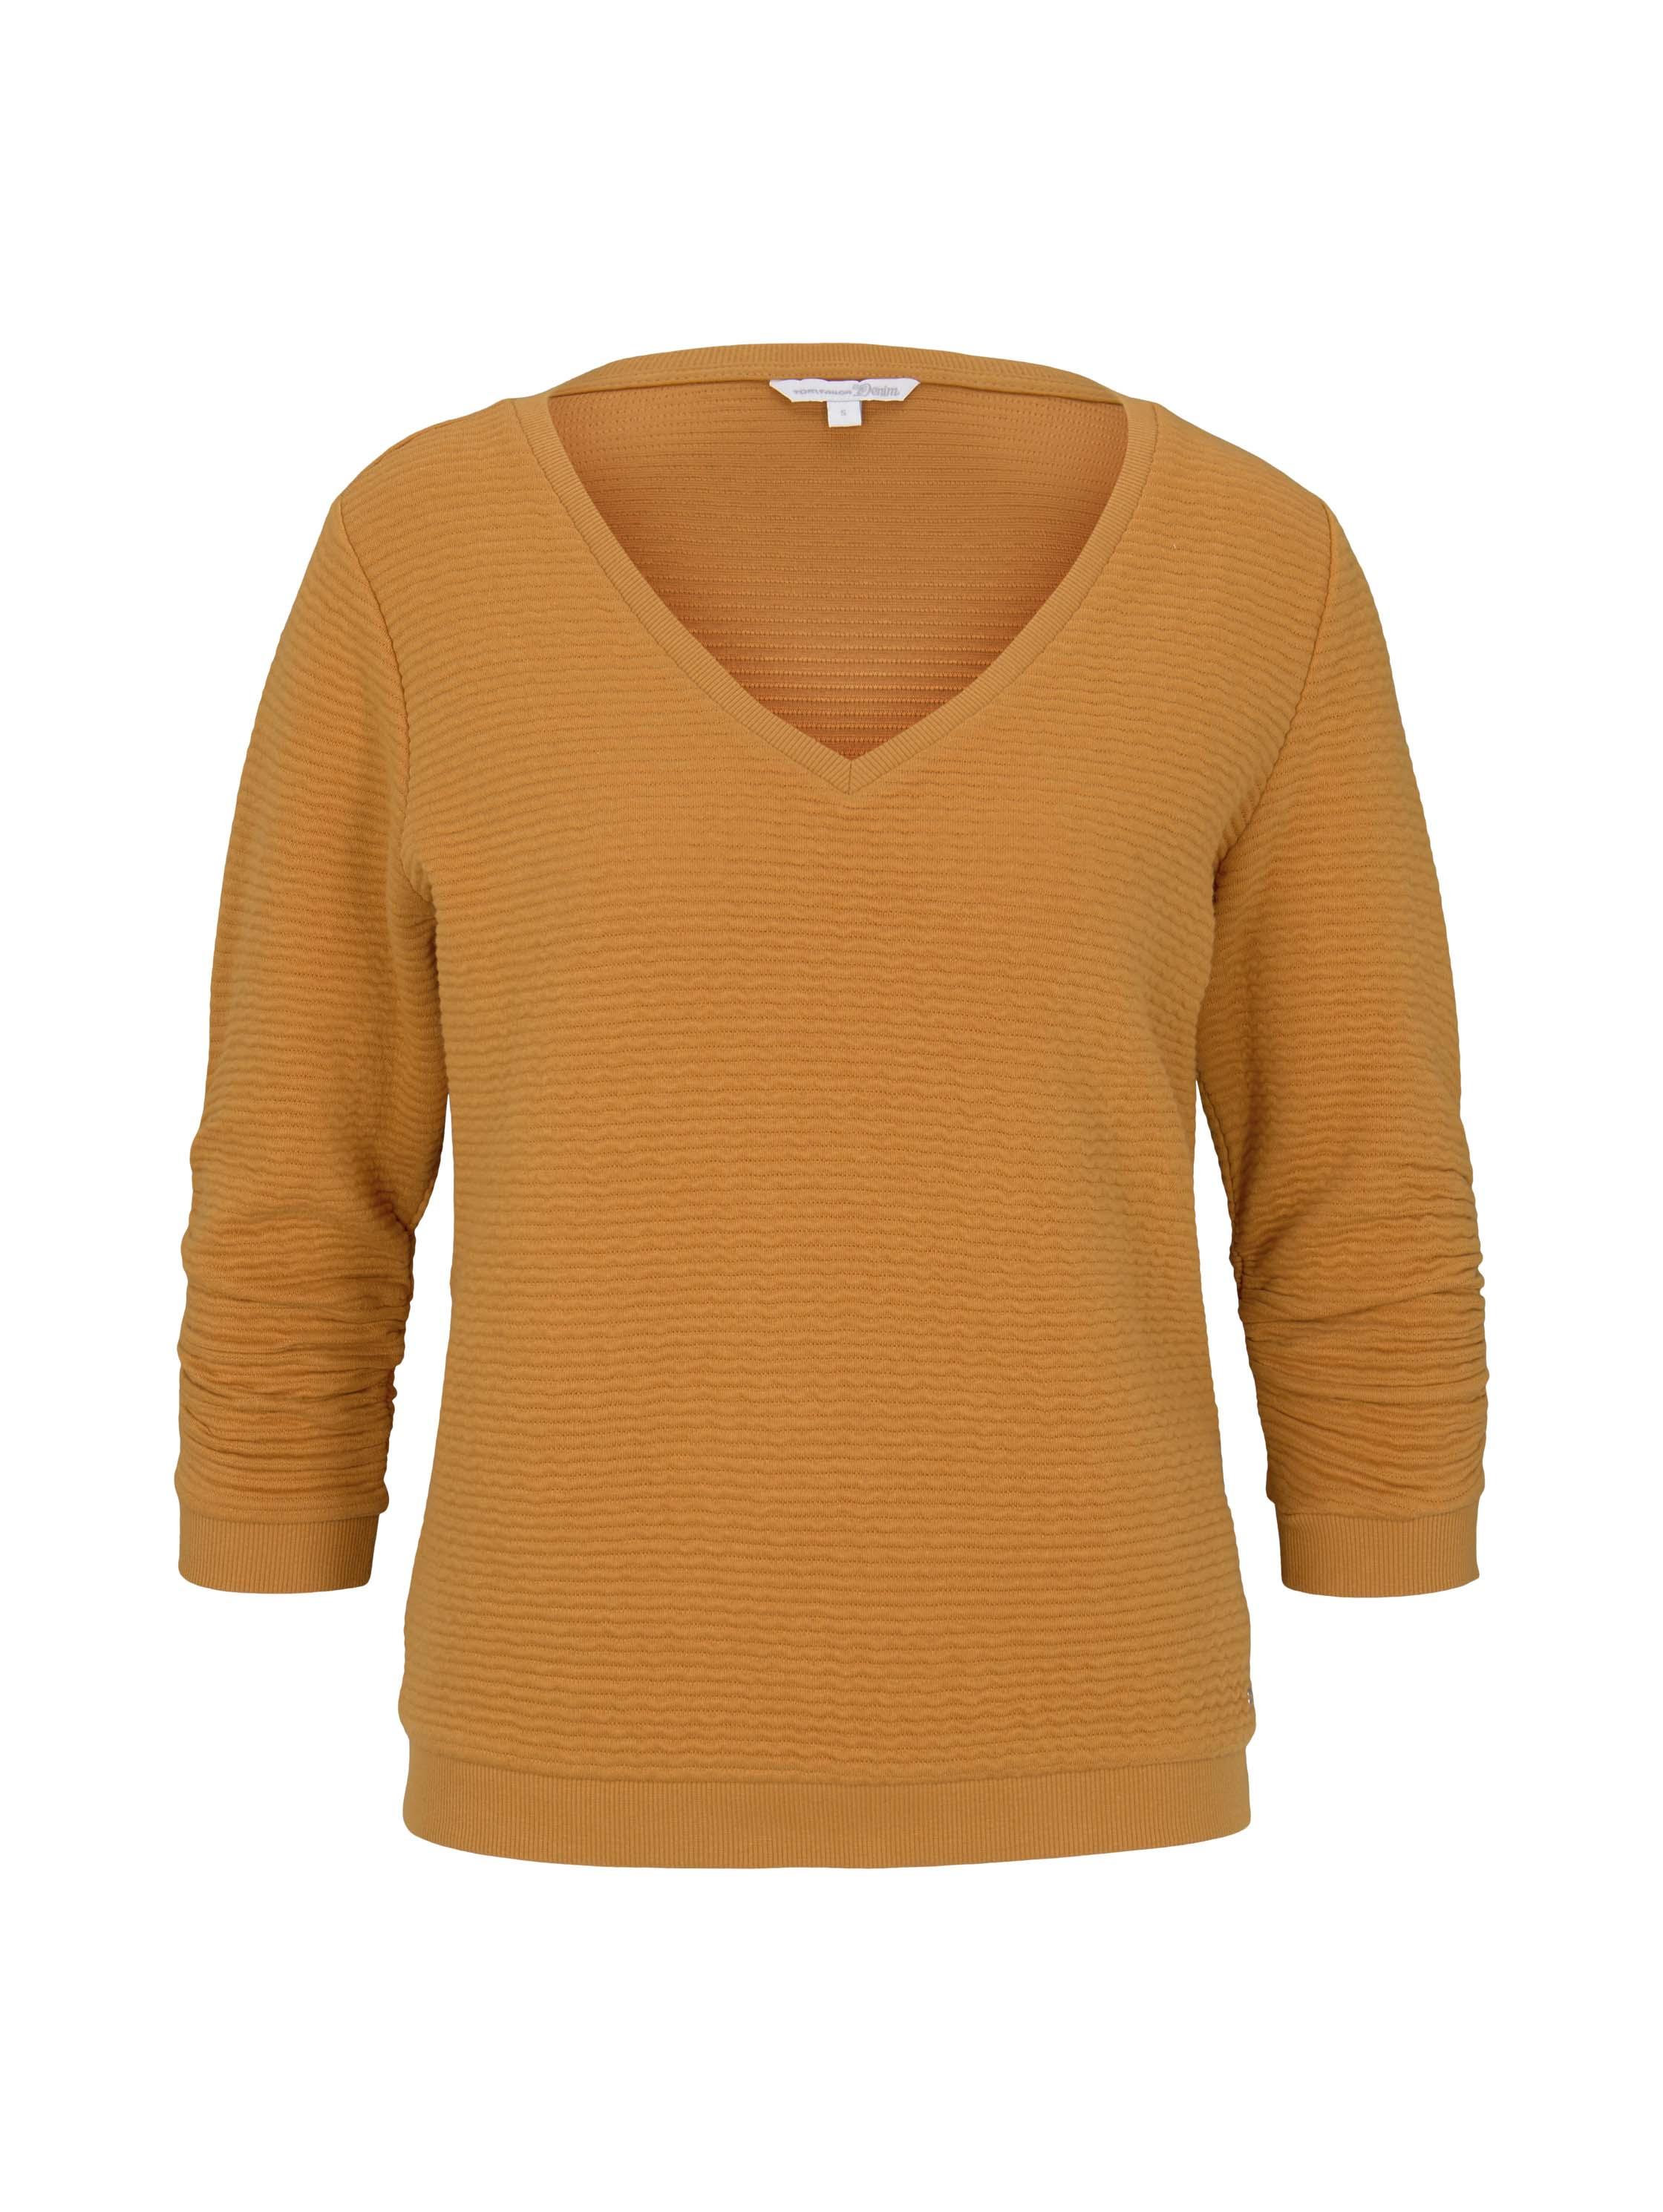 structured sweat, orange yellow